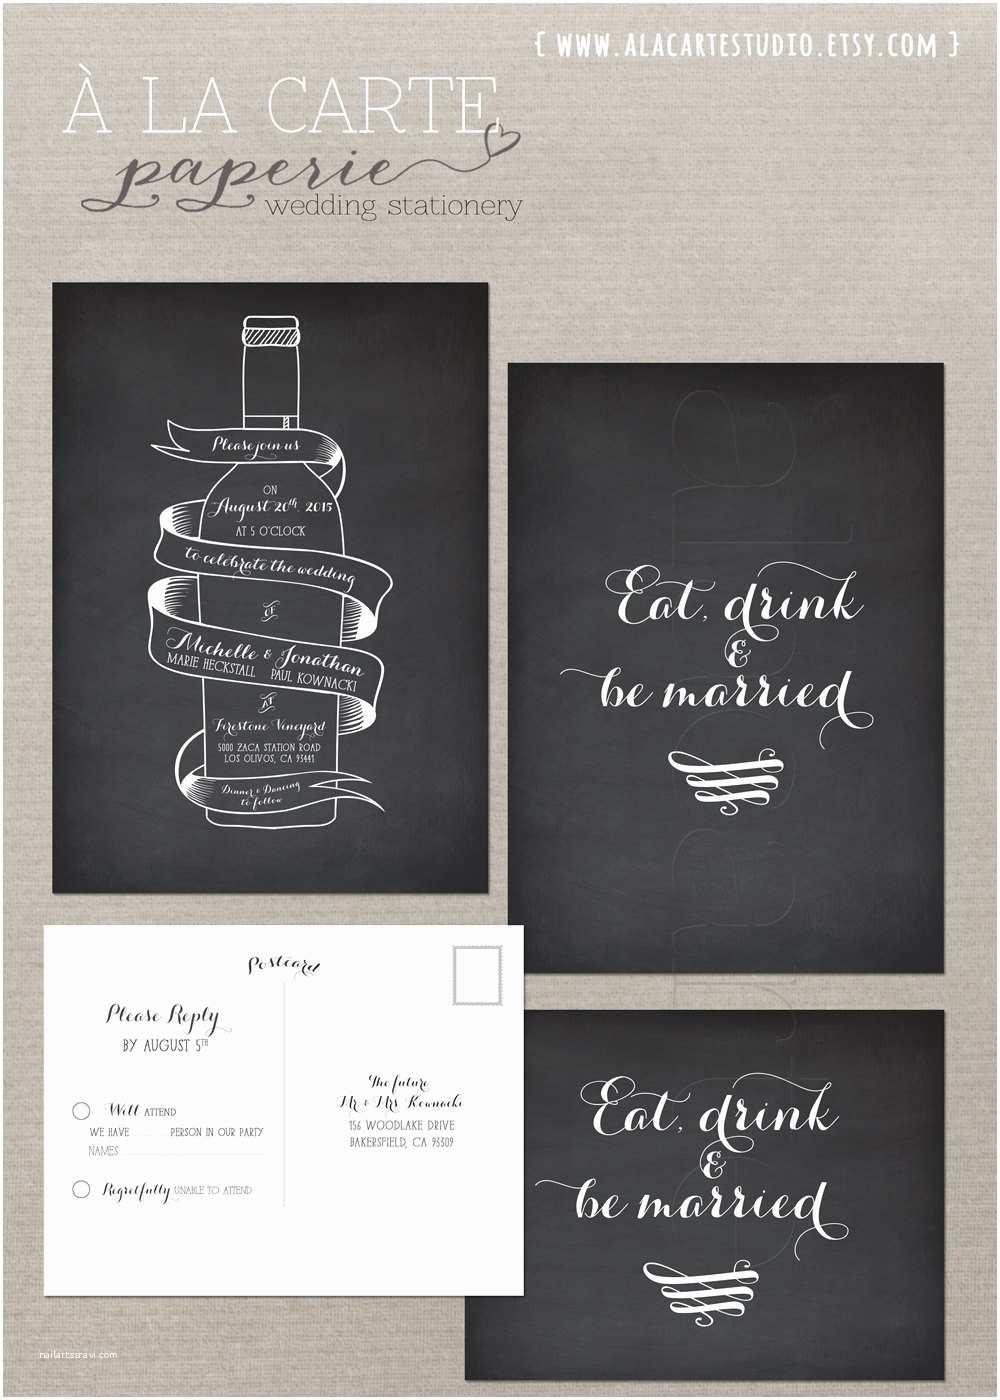 Wine Bottle Wedding Invitations Wine Bottle Chalkboard Inspired Wedding Invitation Card and